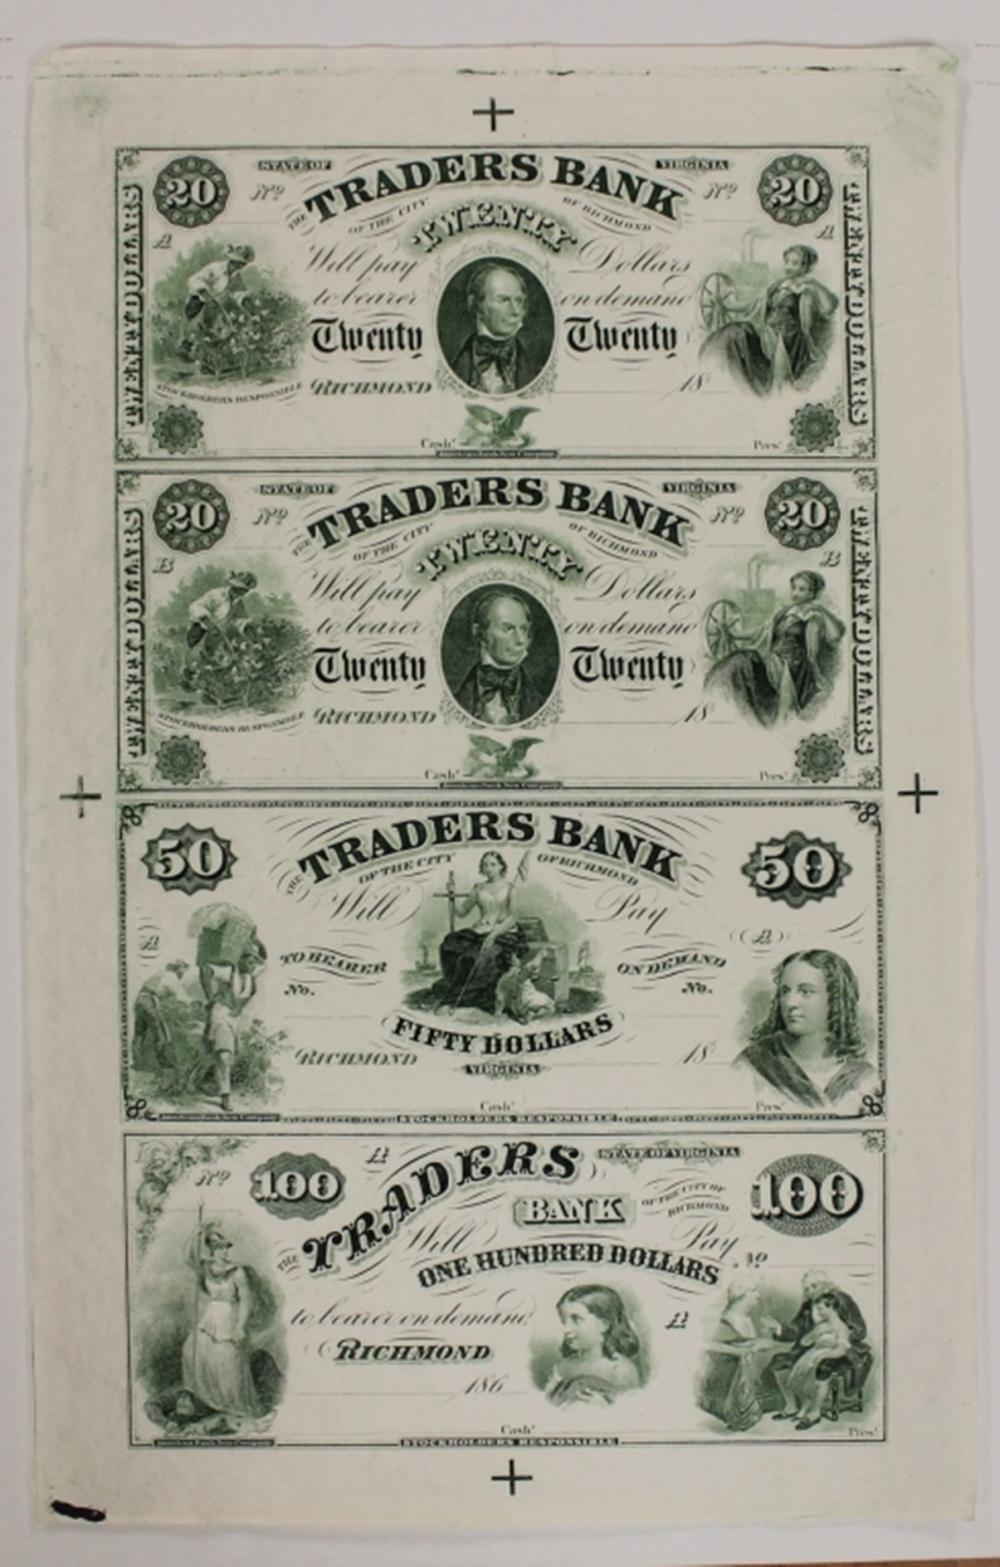 Lot 202: 1860'S VIRGINIA TRADERS BANK PROOF SHEET